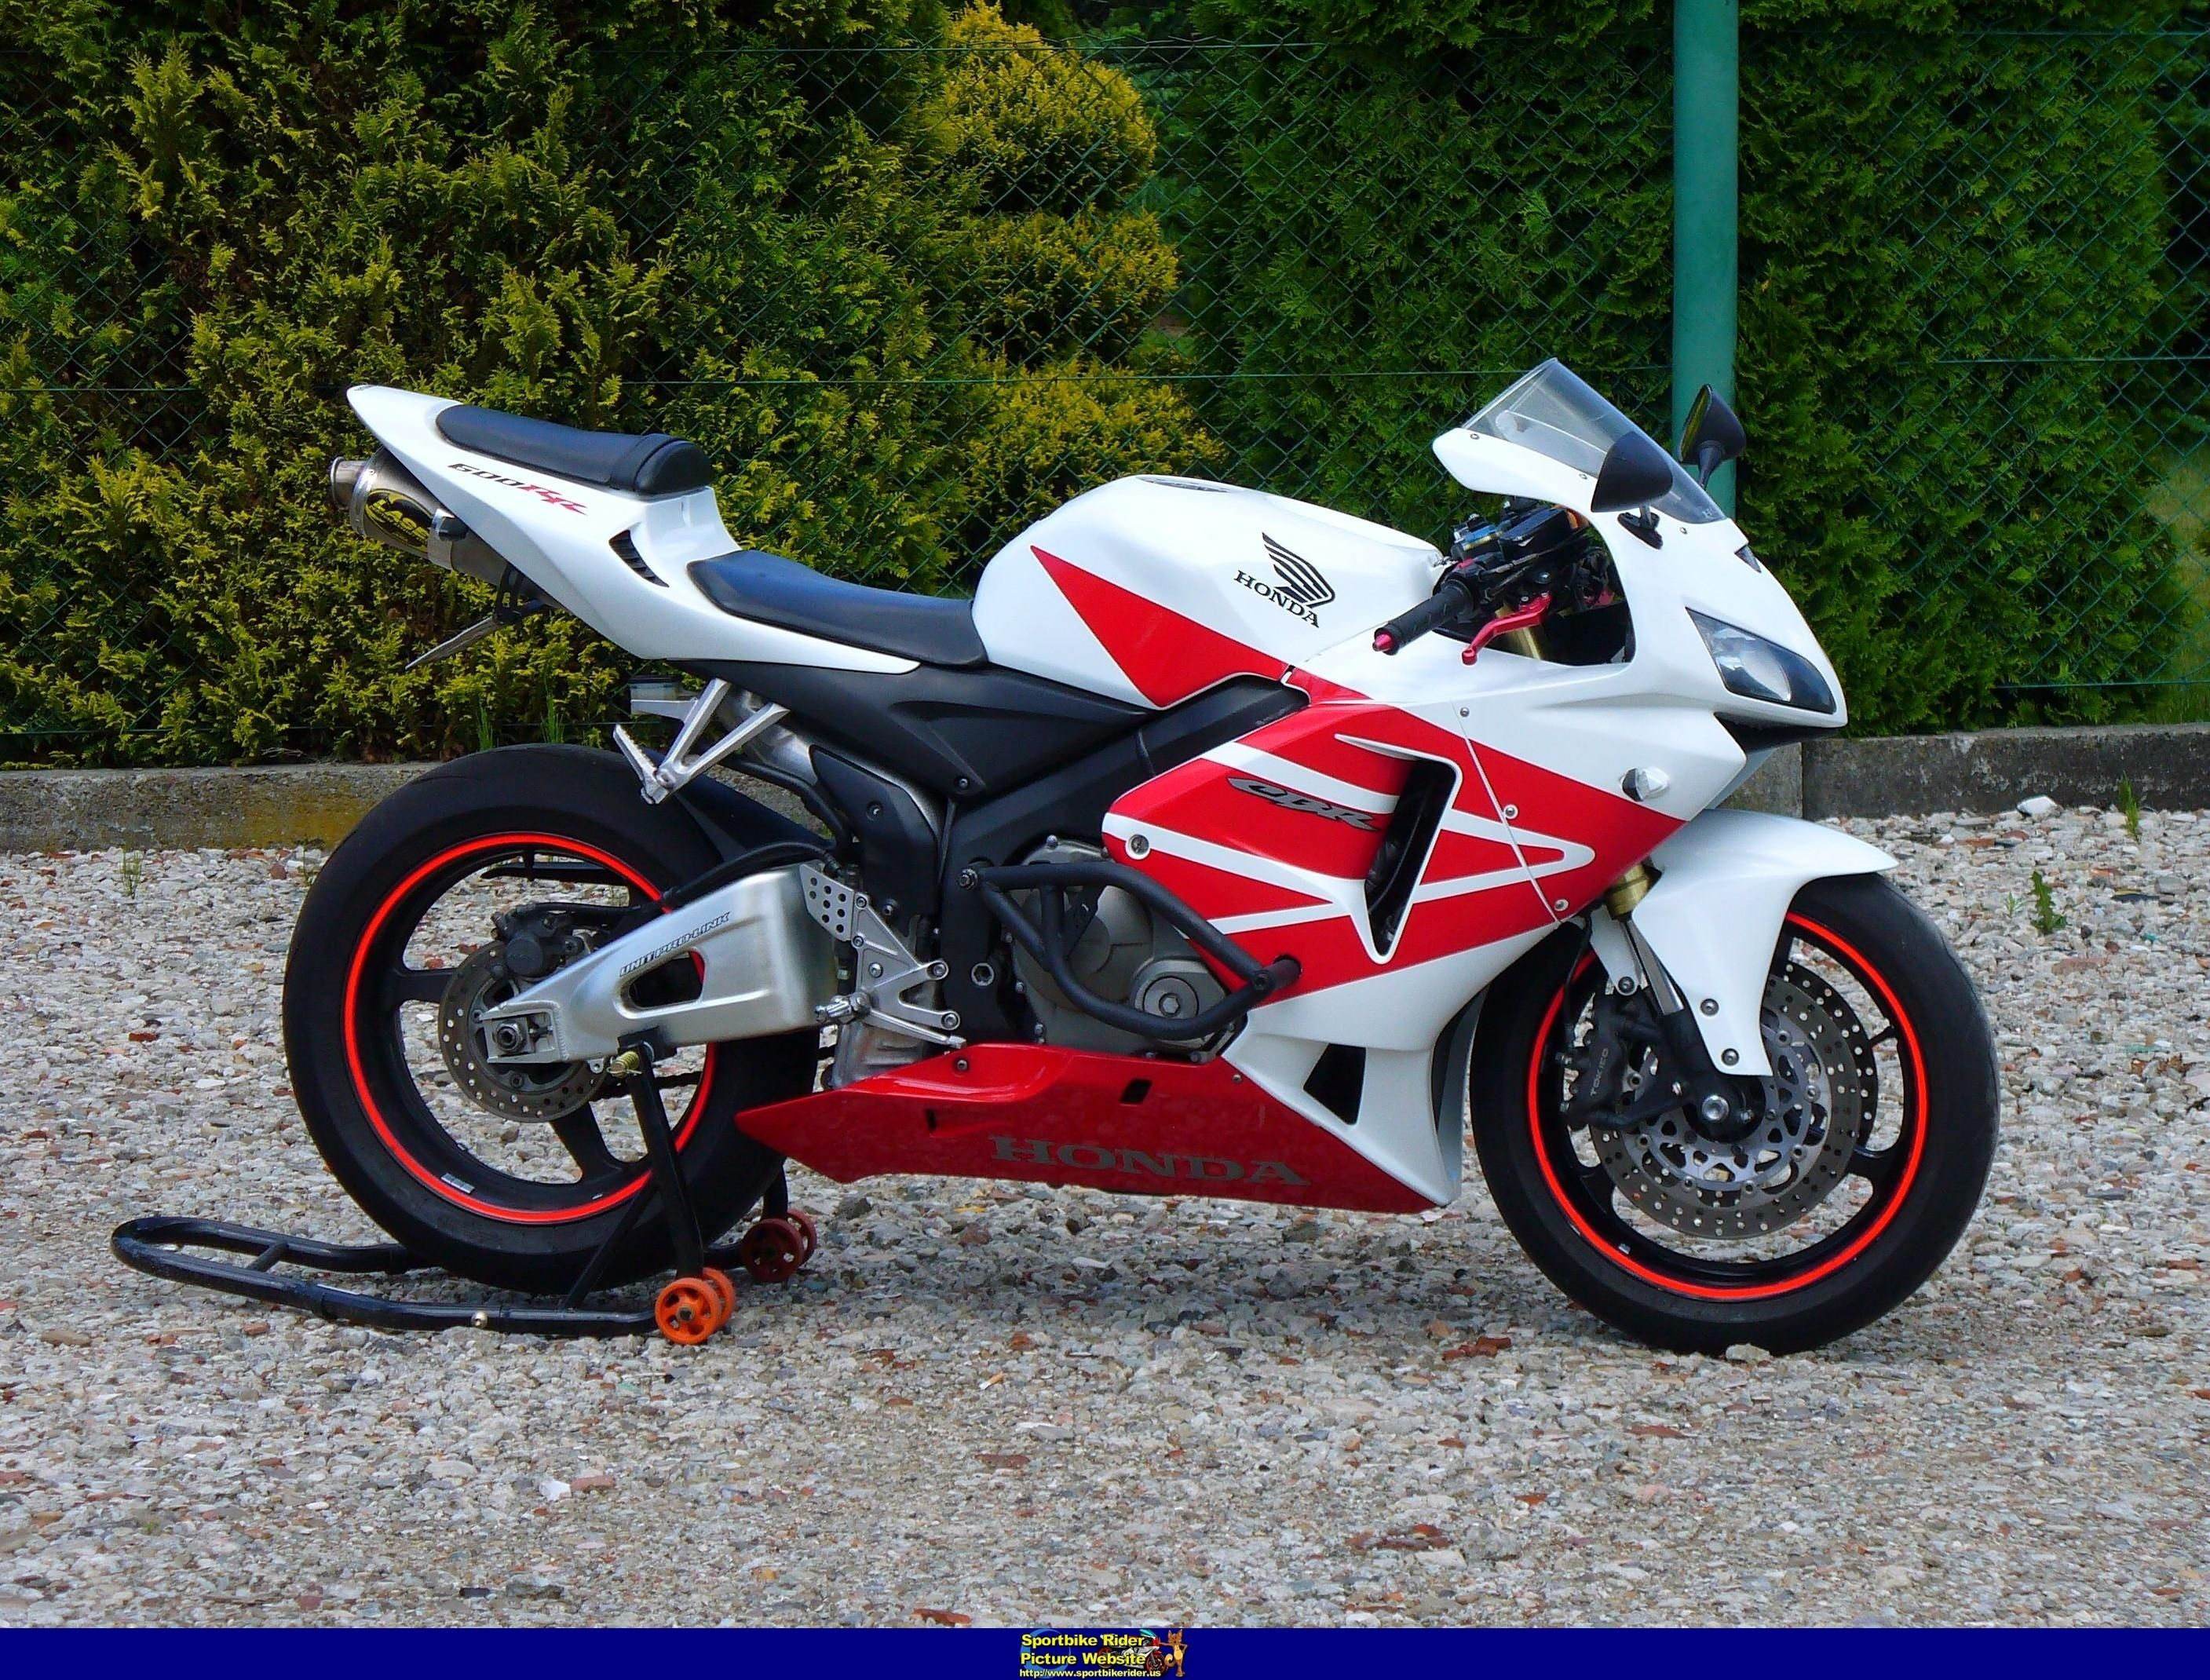 2005 Cbr 600 Rr Honda Cbr 1000 Rr Honda Cbr 1000rr Honda Cbr